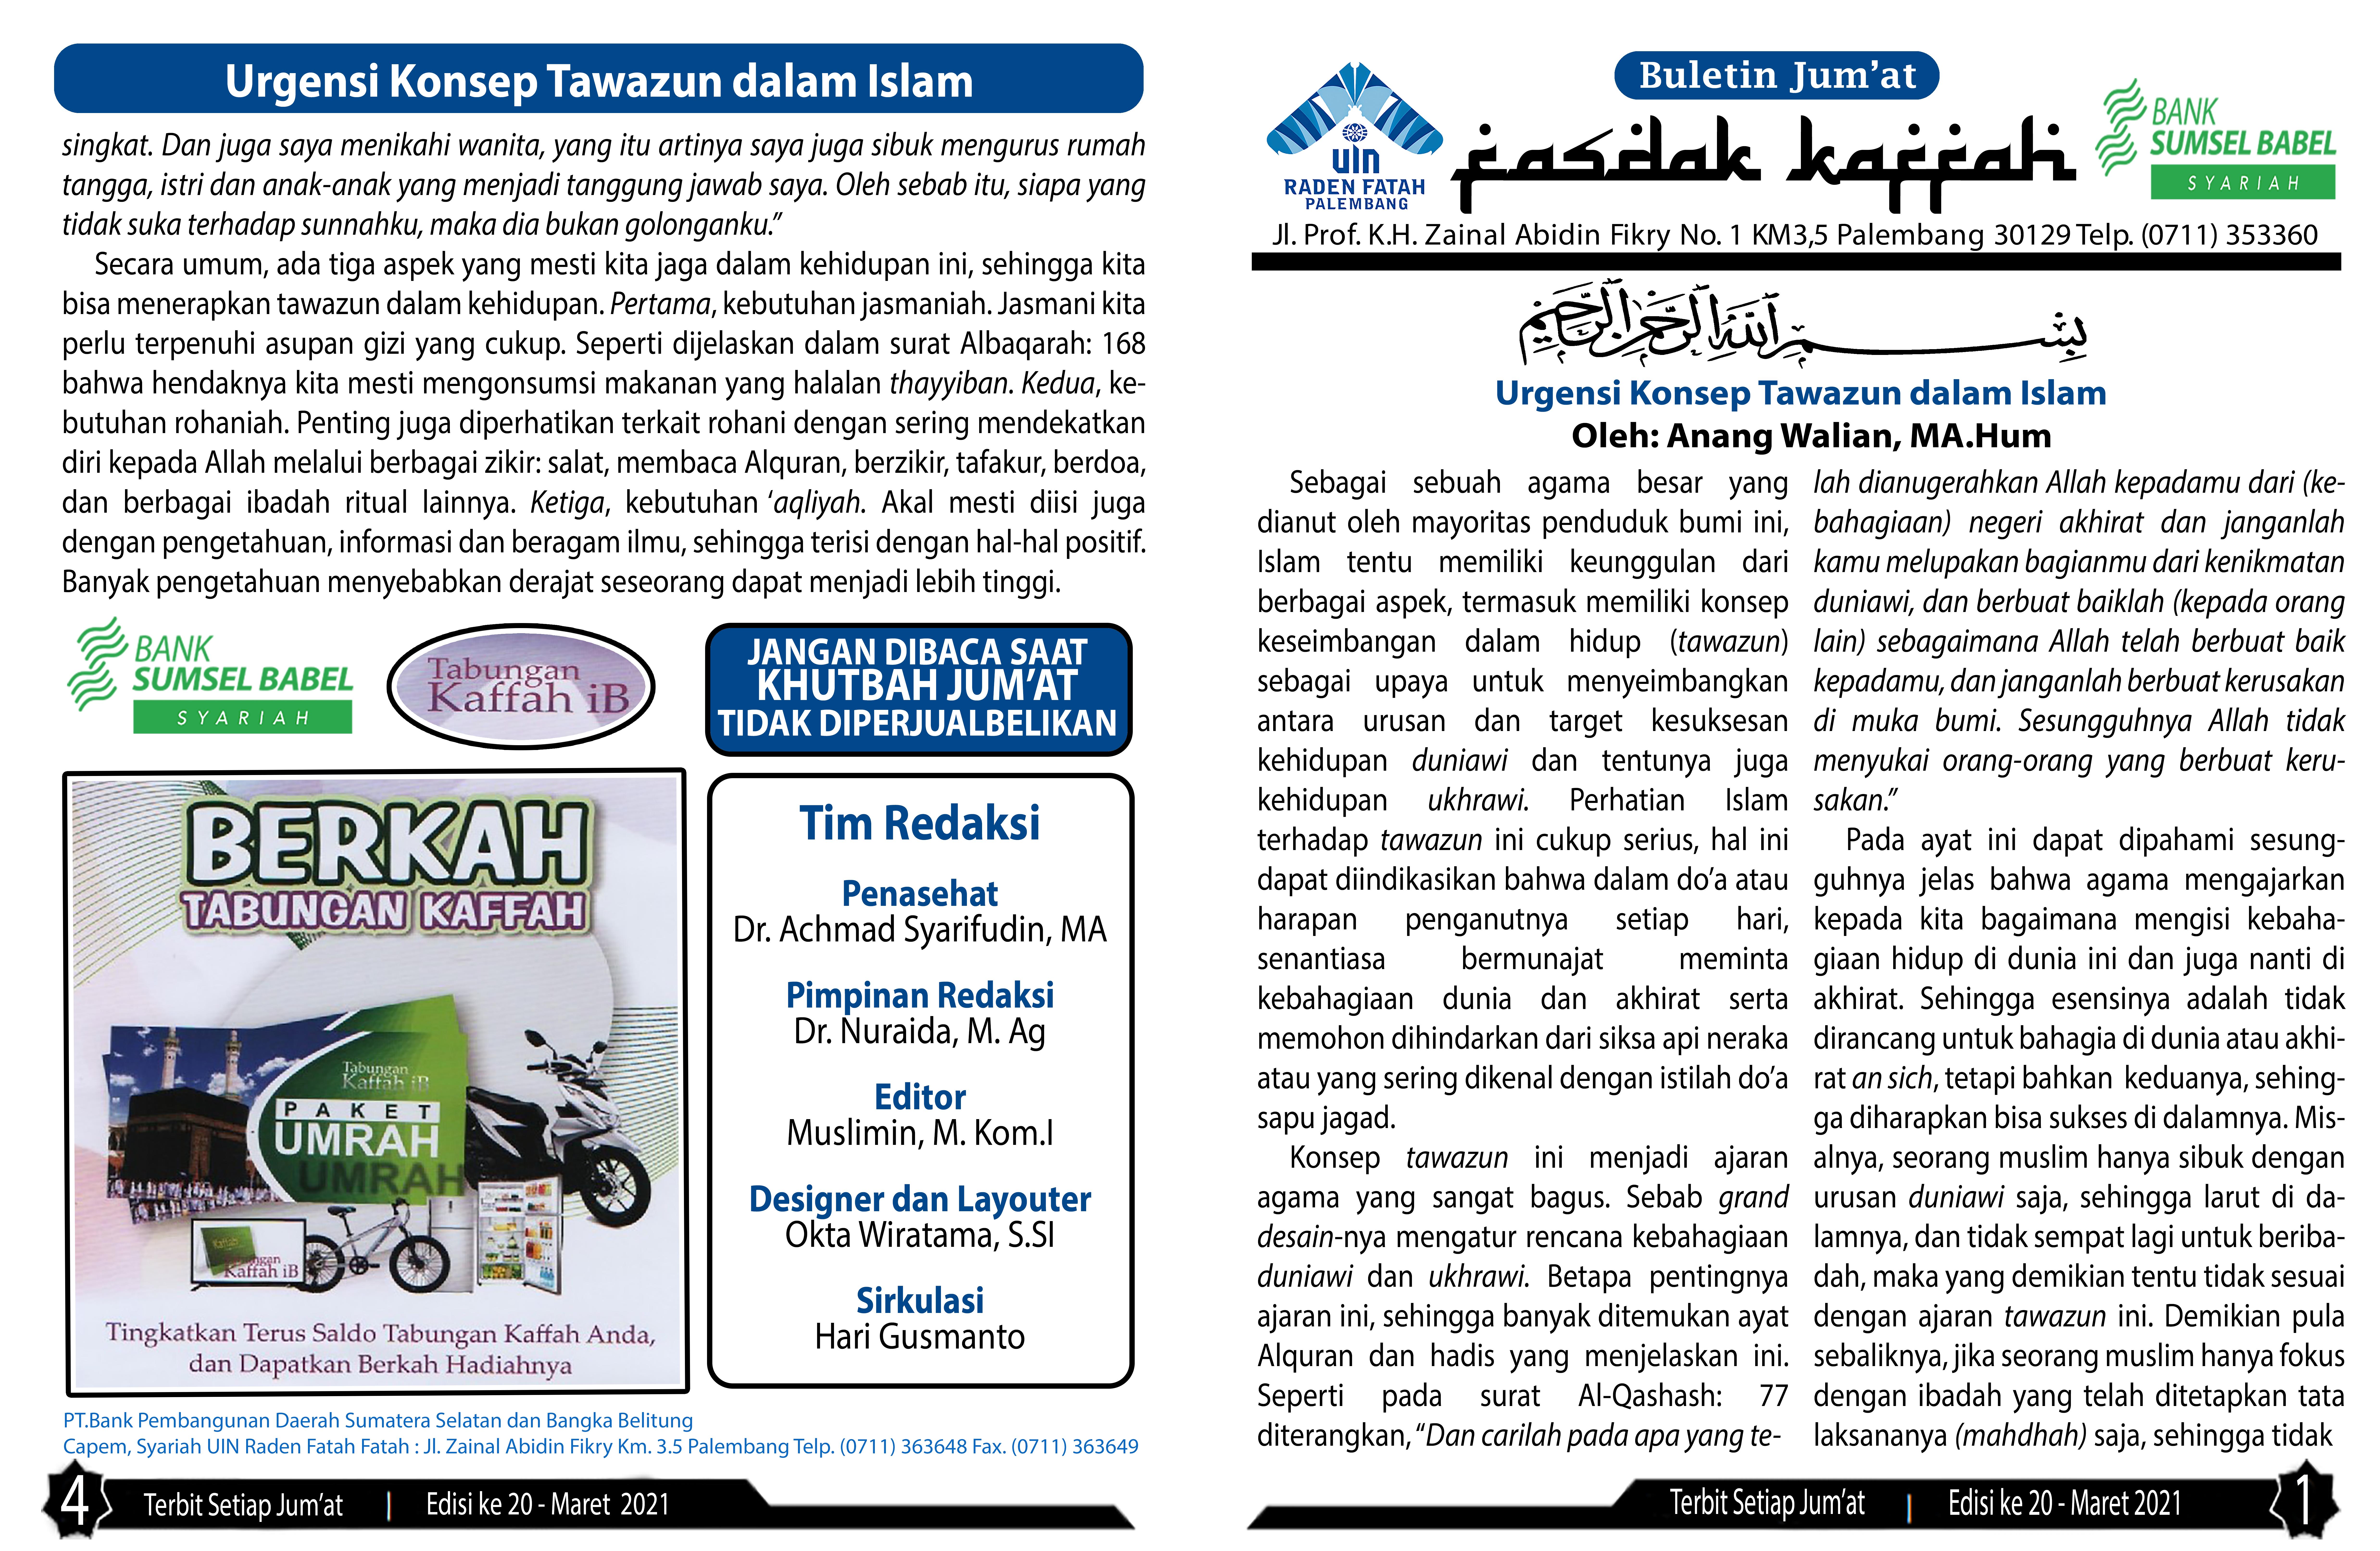 template-1c-edisi-20